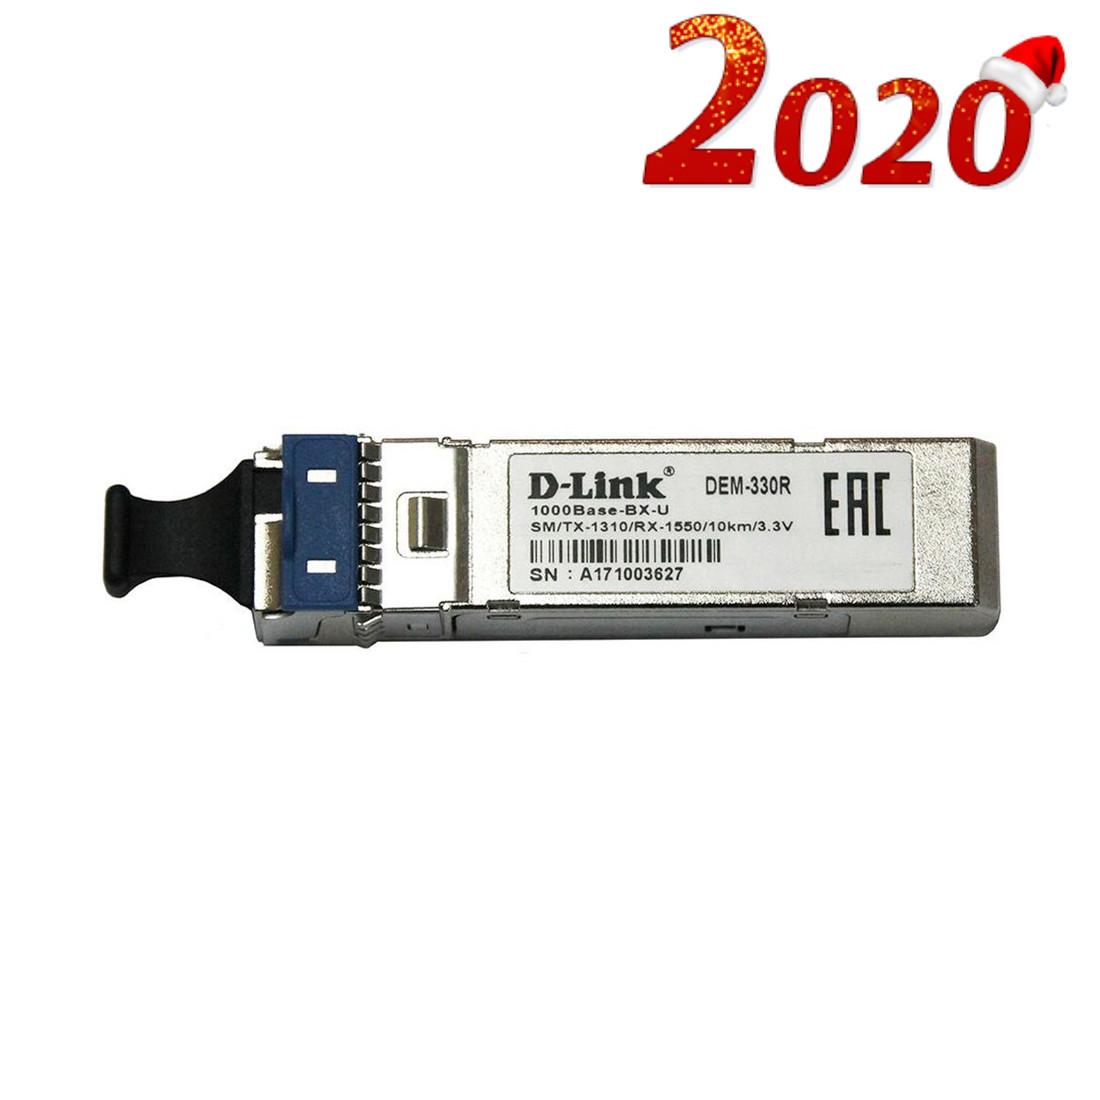 Трансивер D-Link DEM-330R/10KM/A1A